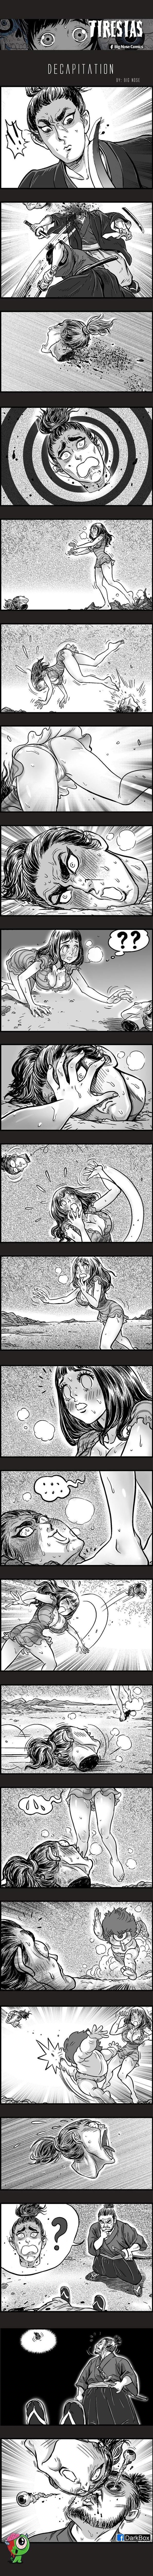 Обезглавливание Tiresias, Darkbox, Комиксы, Длиннопост